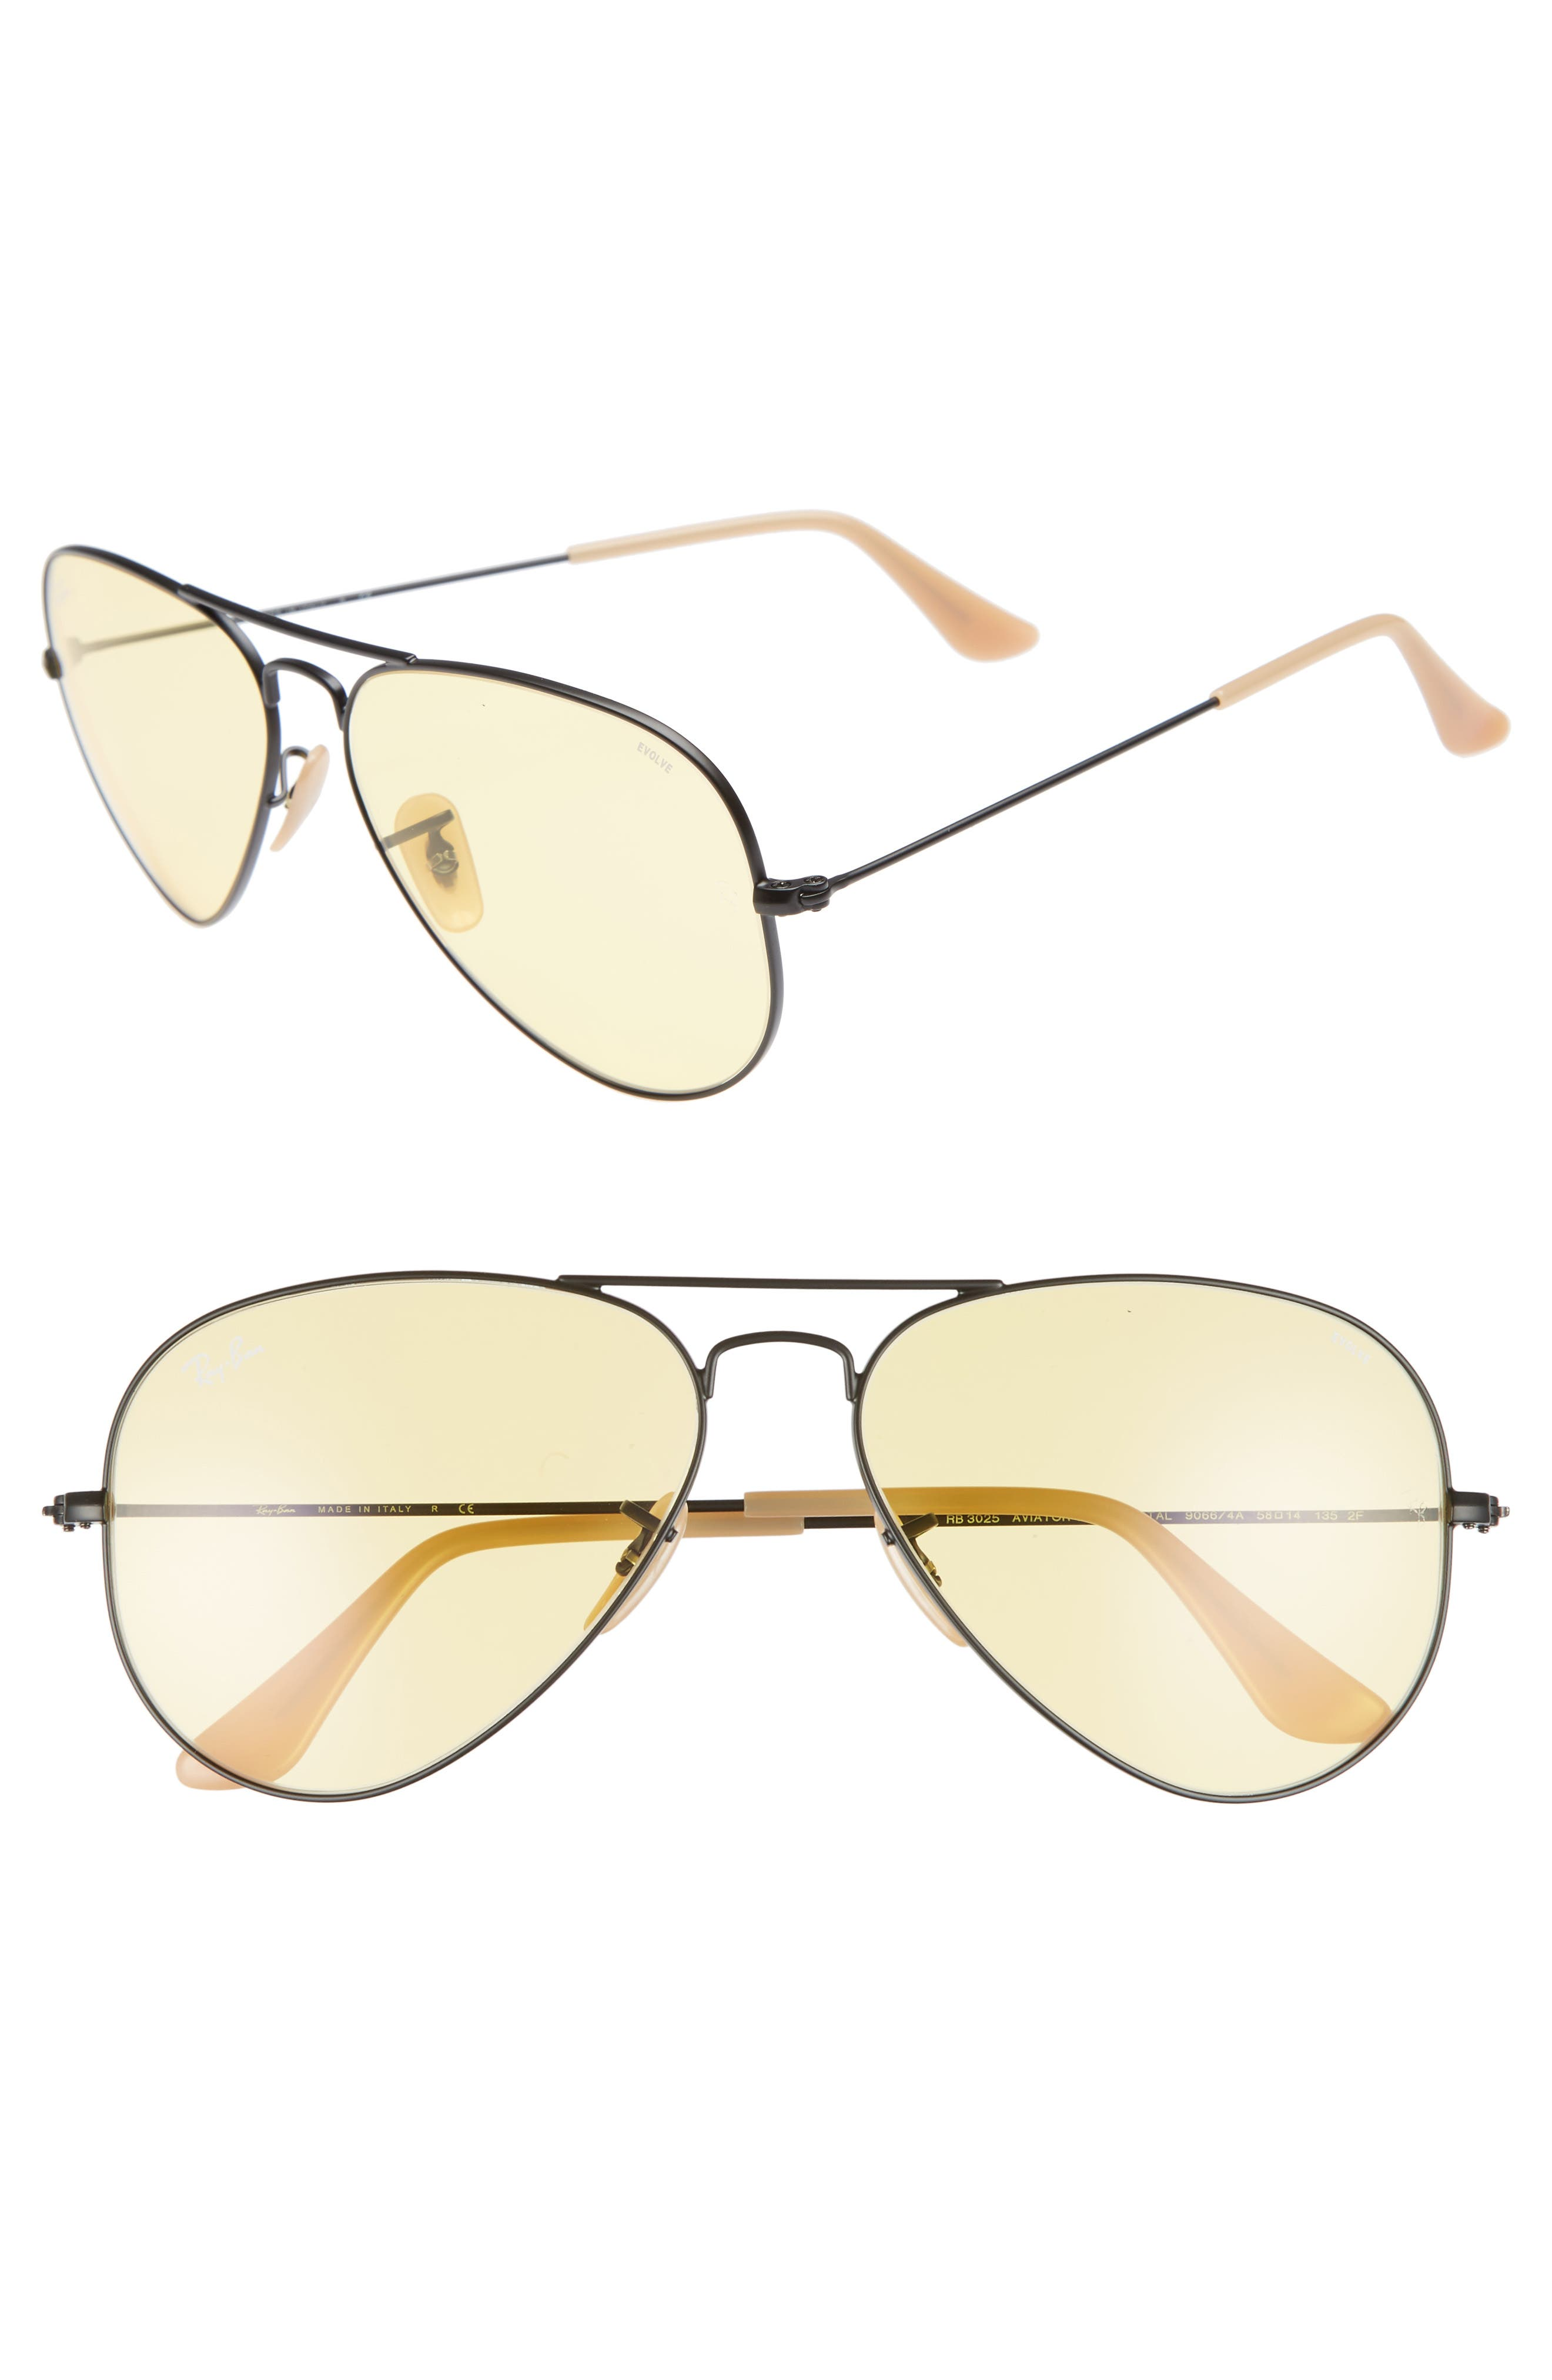 Main Image - Ray-Ban Evolve 58mm Polarized Aviator Sunglasses